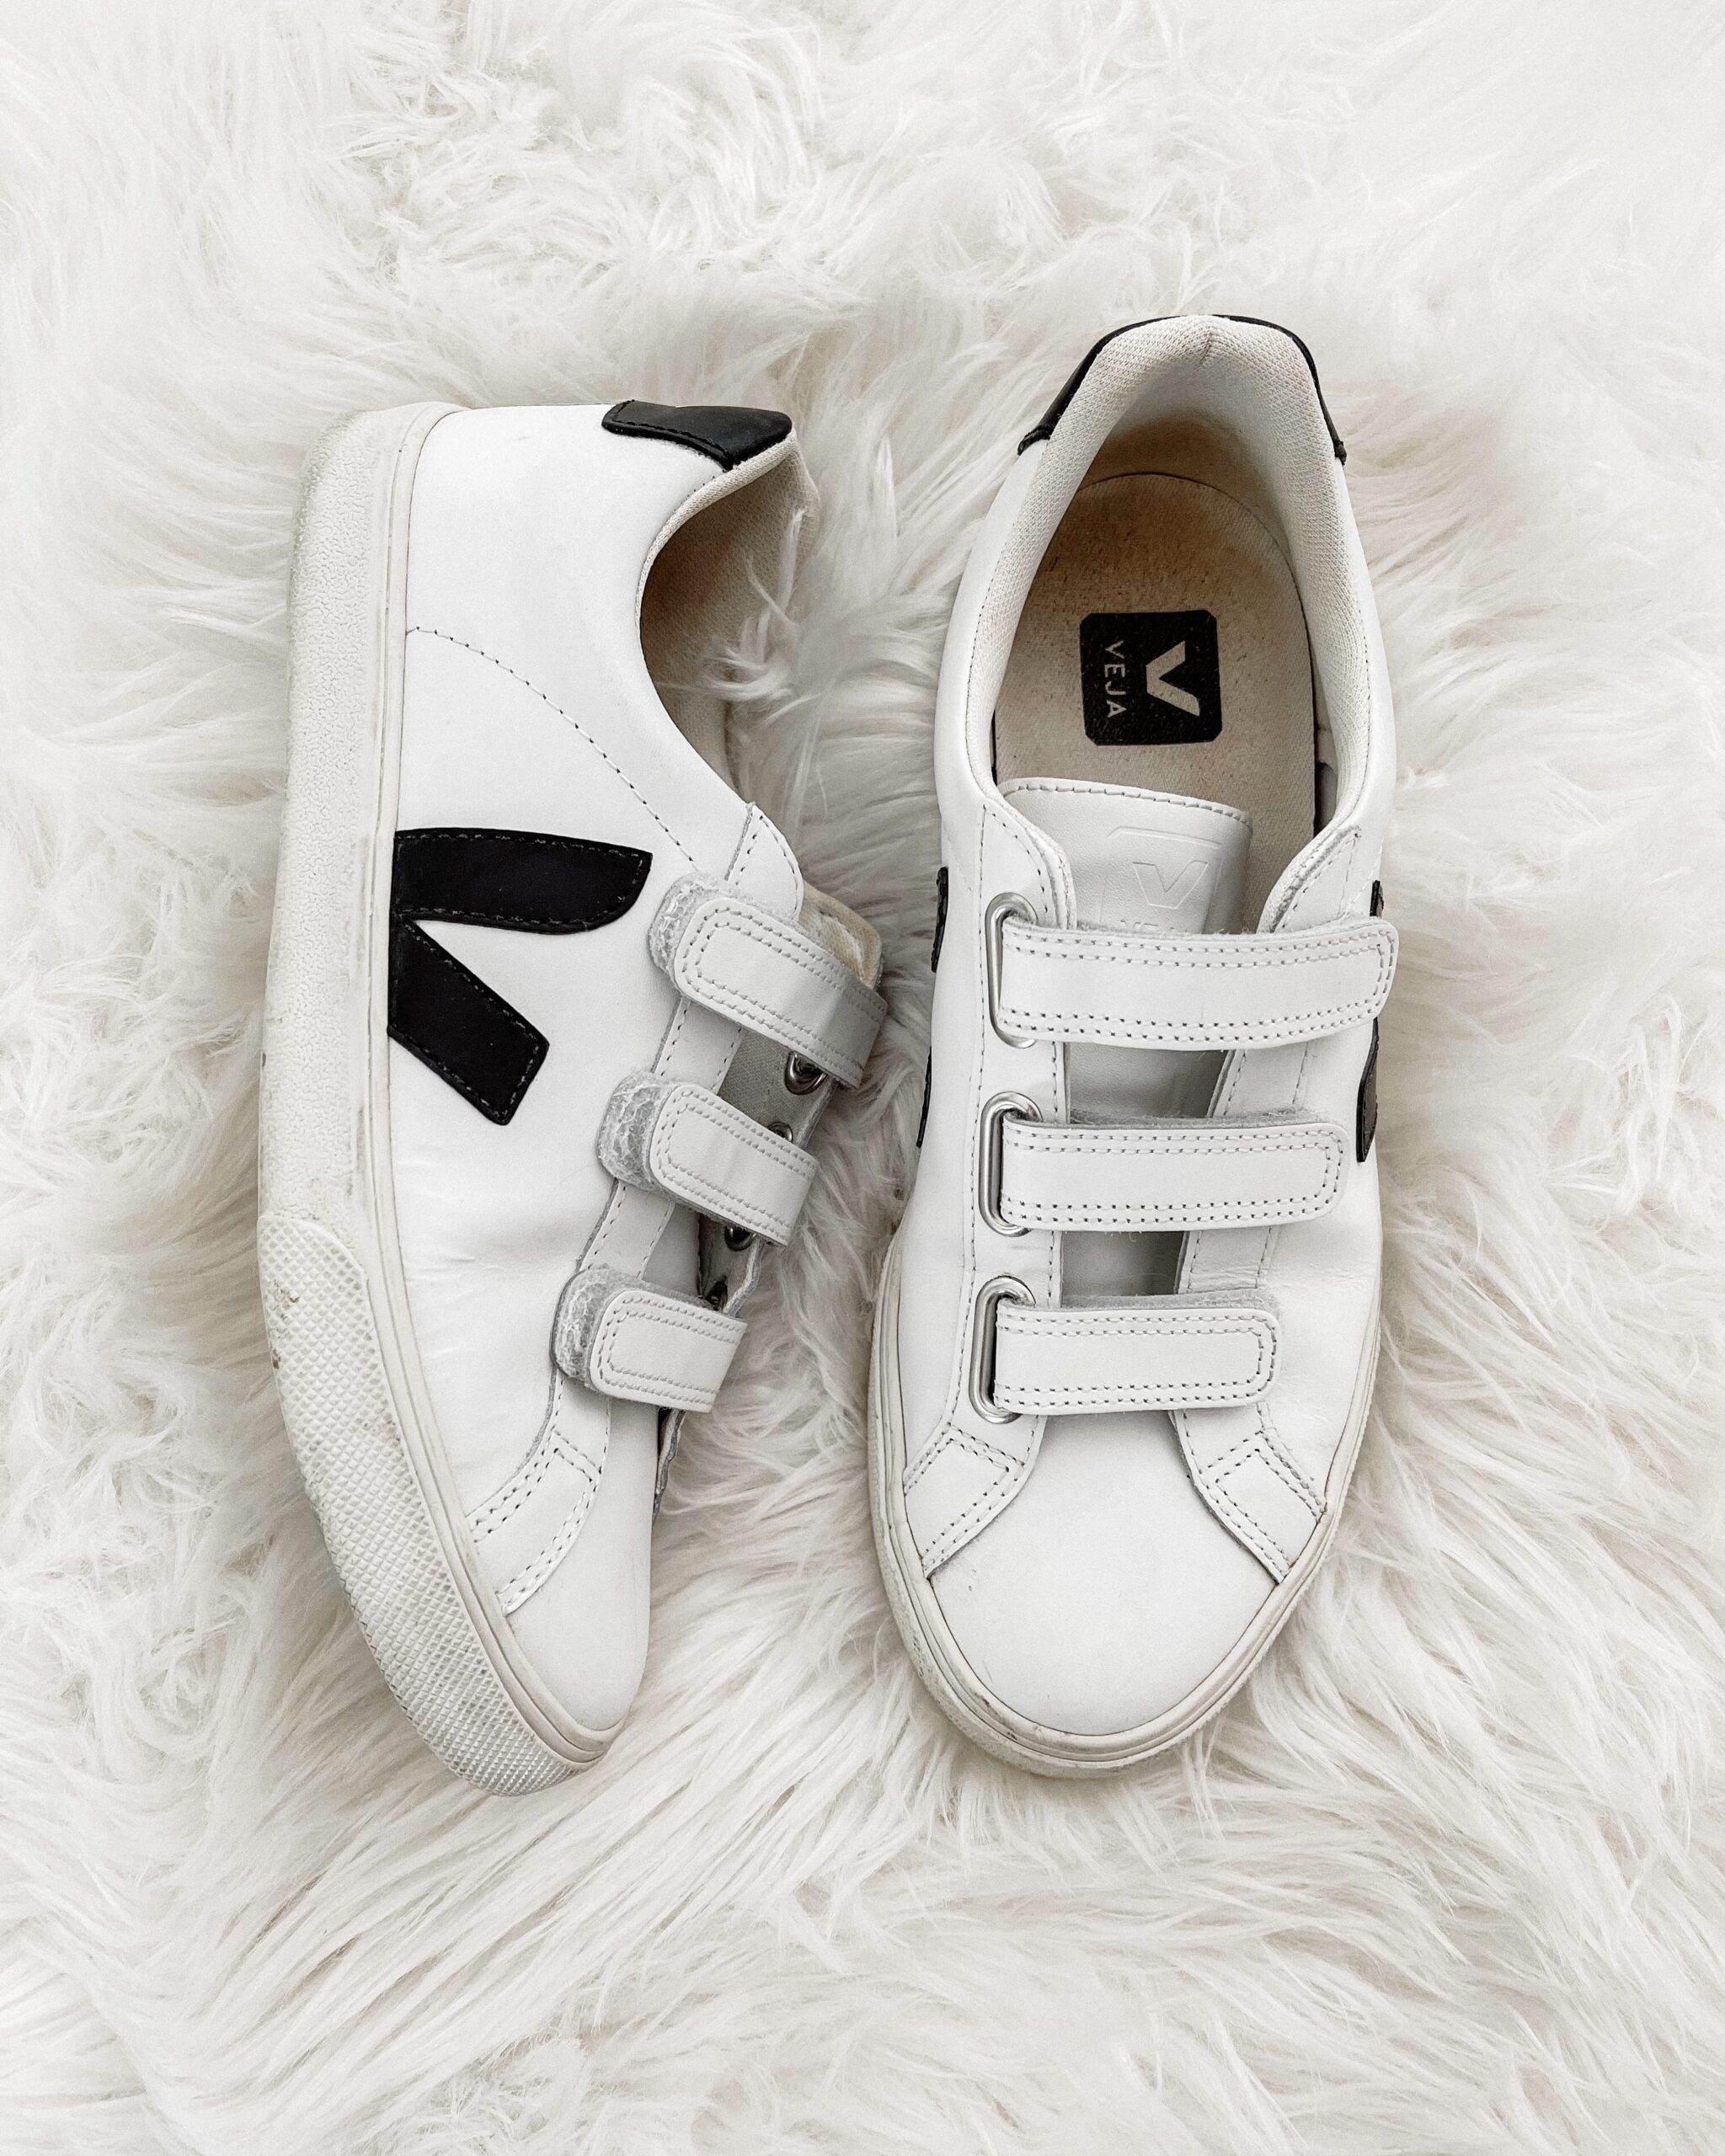 Fashion Jackson Veja Women's 3-Lock Low Top Sneakers